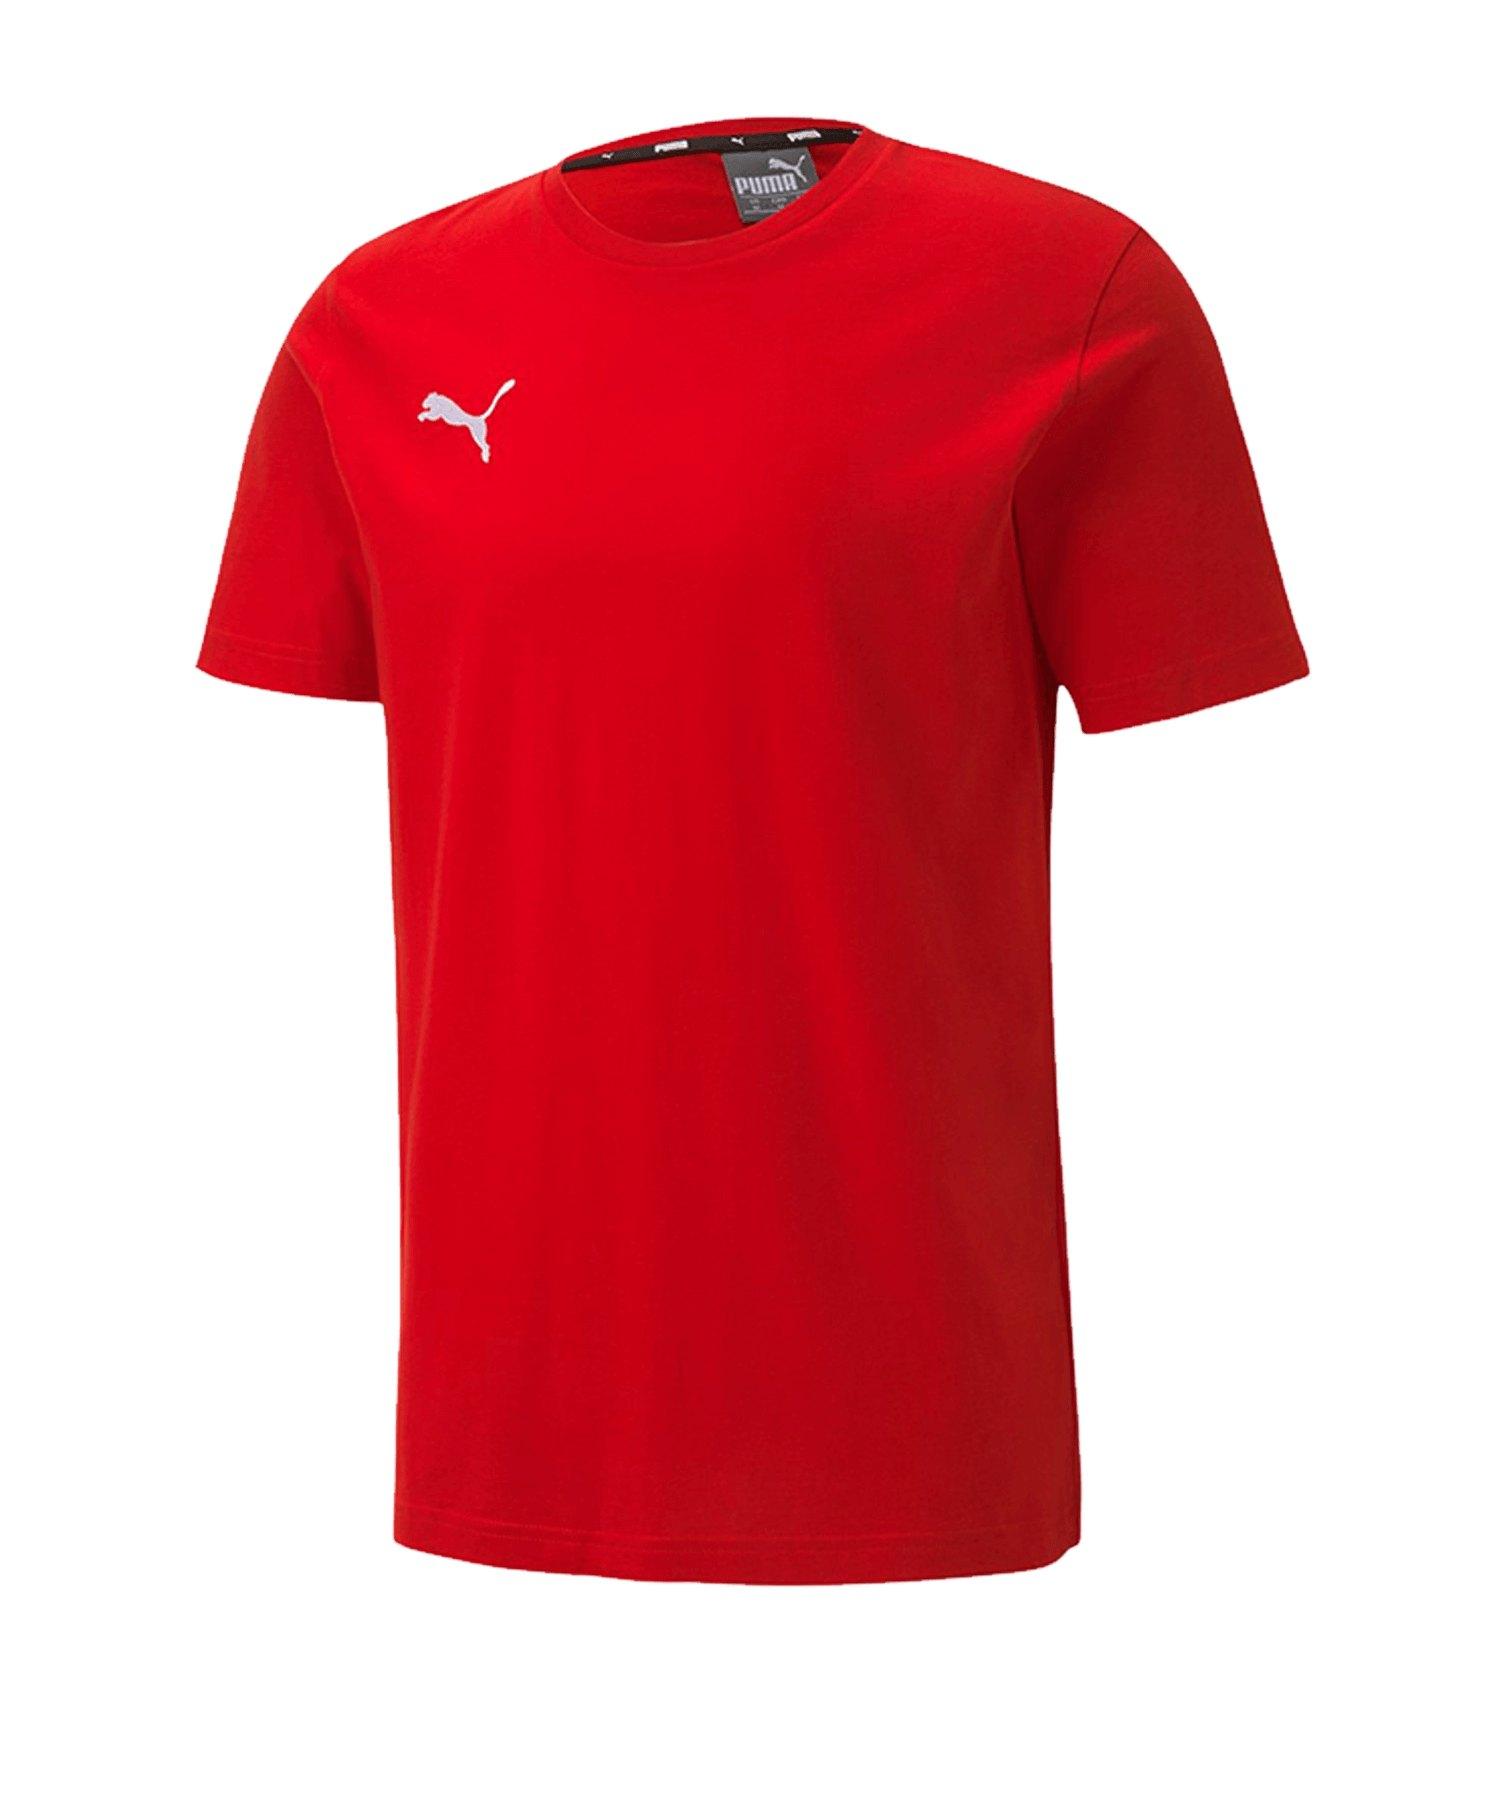 PUMA teamGOAL 23 Casuals Tee T-Shirt Rot F01 - rot